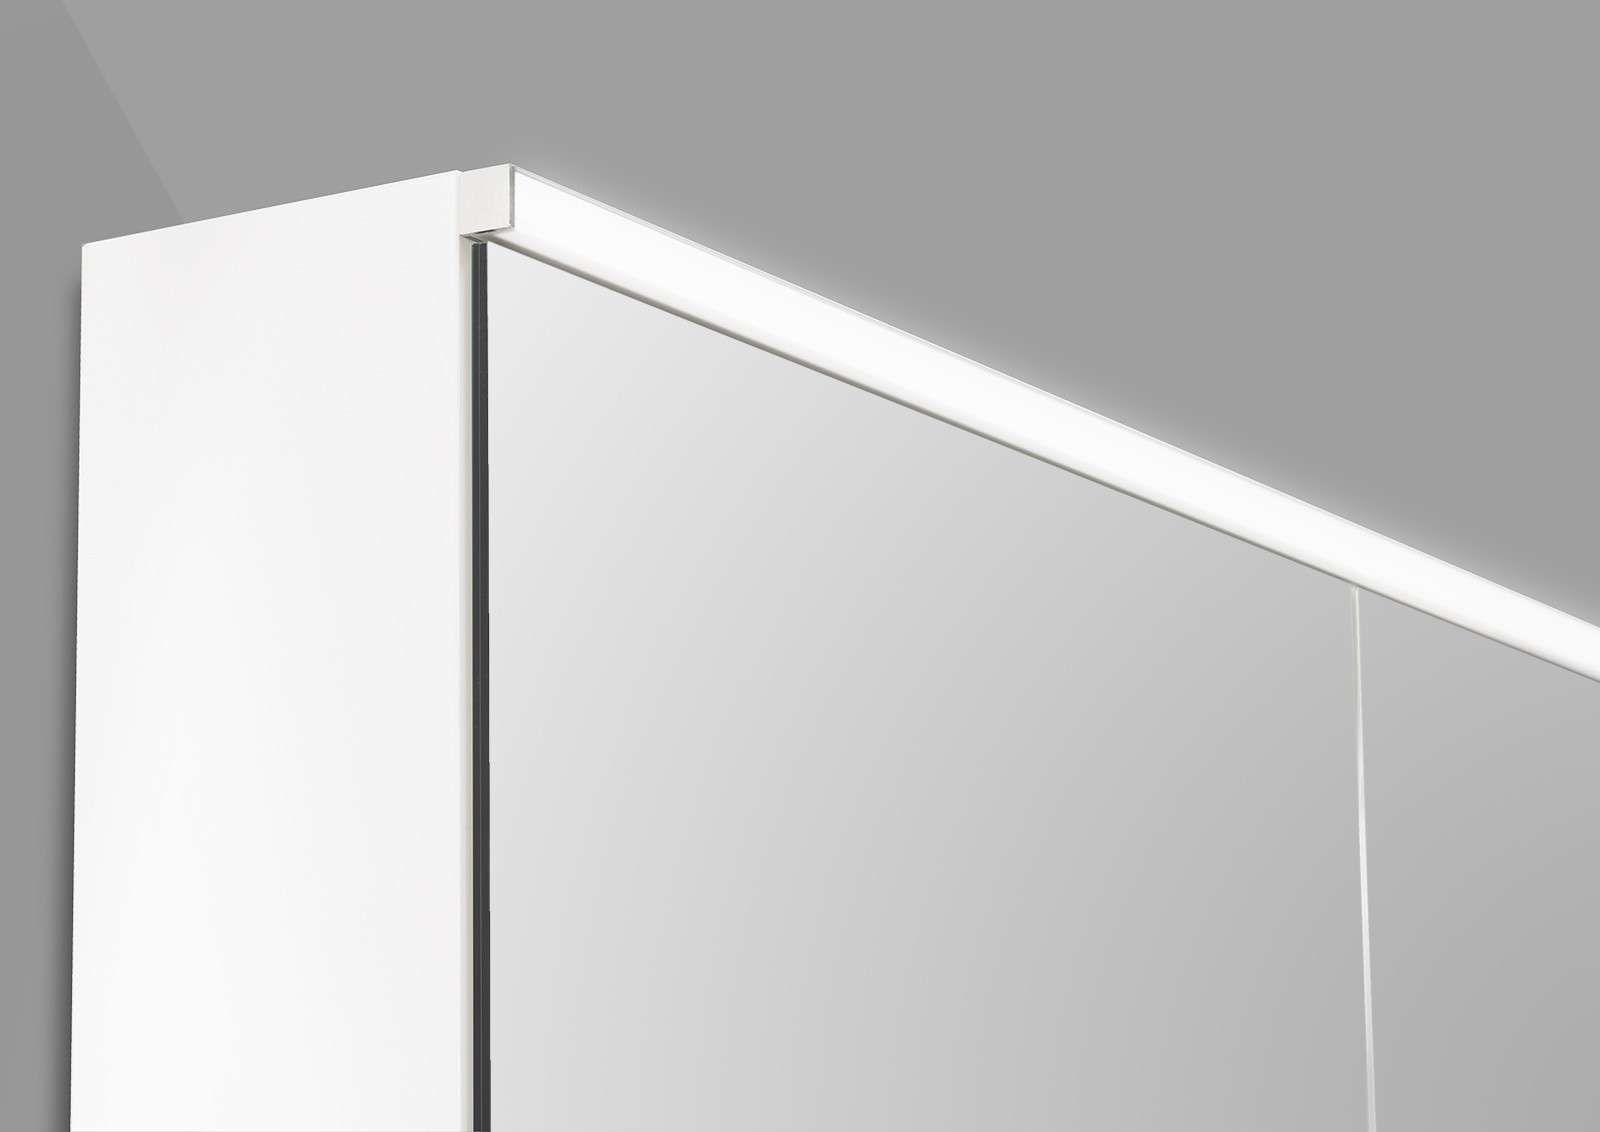 Designbaeder Com Led Beleuchtung Spiegelschrank Led Unterbauleuchte